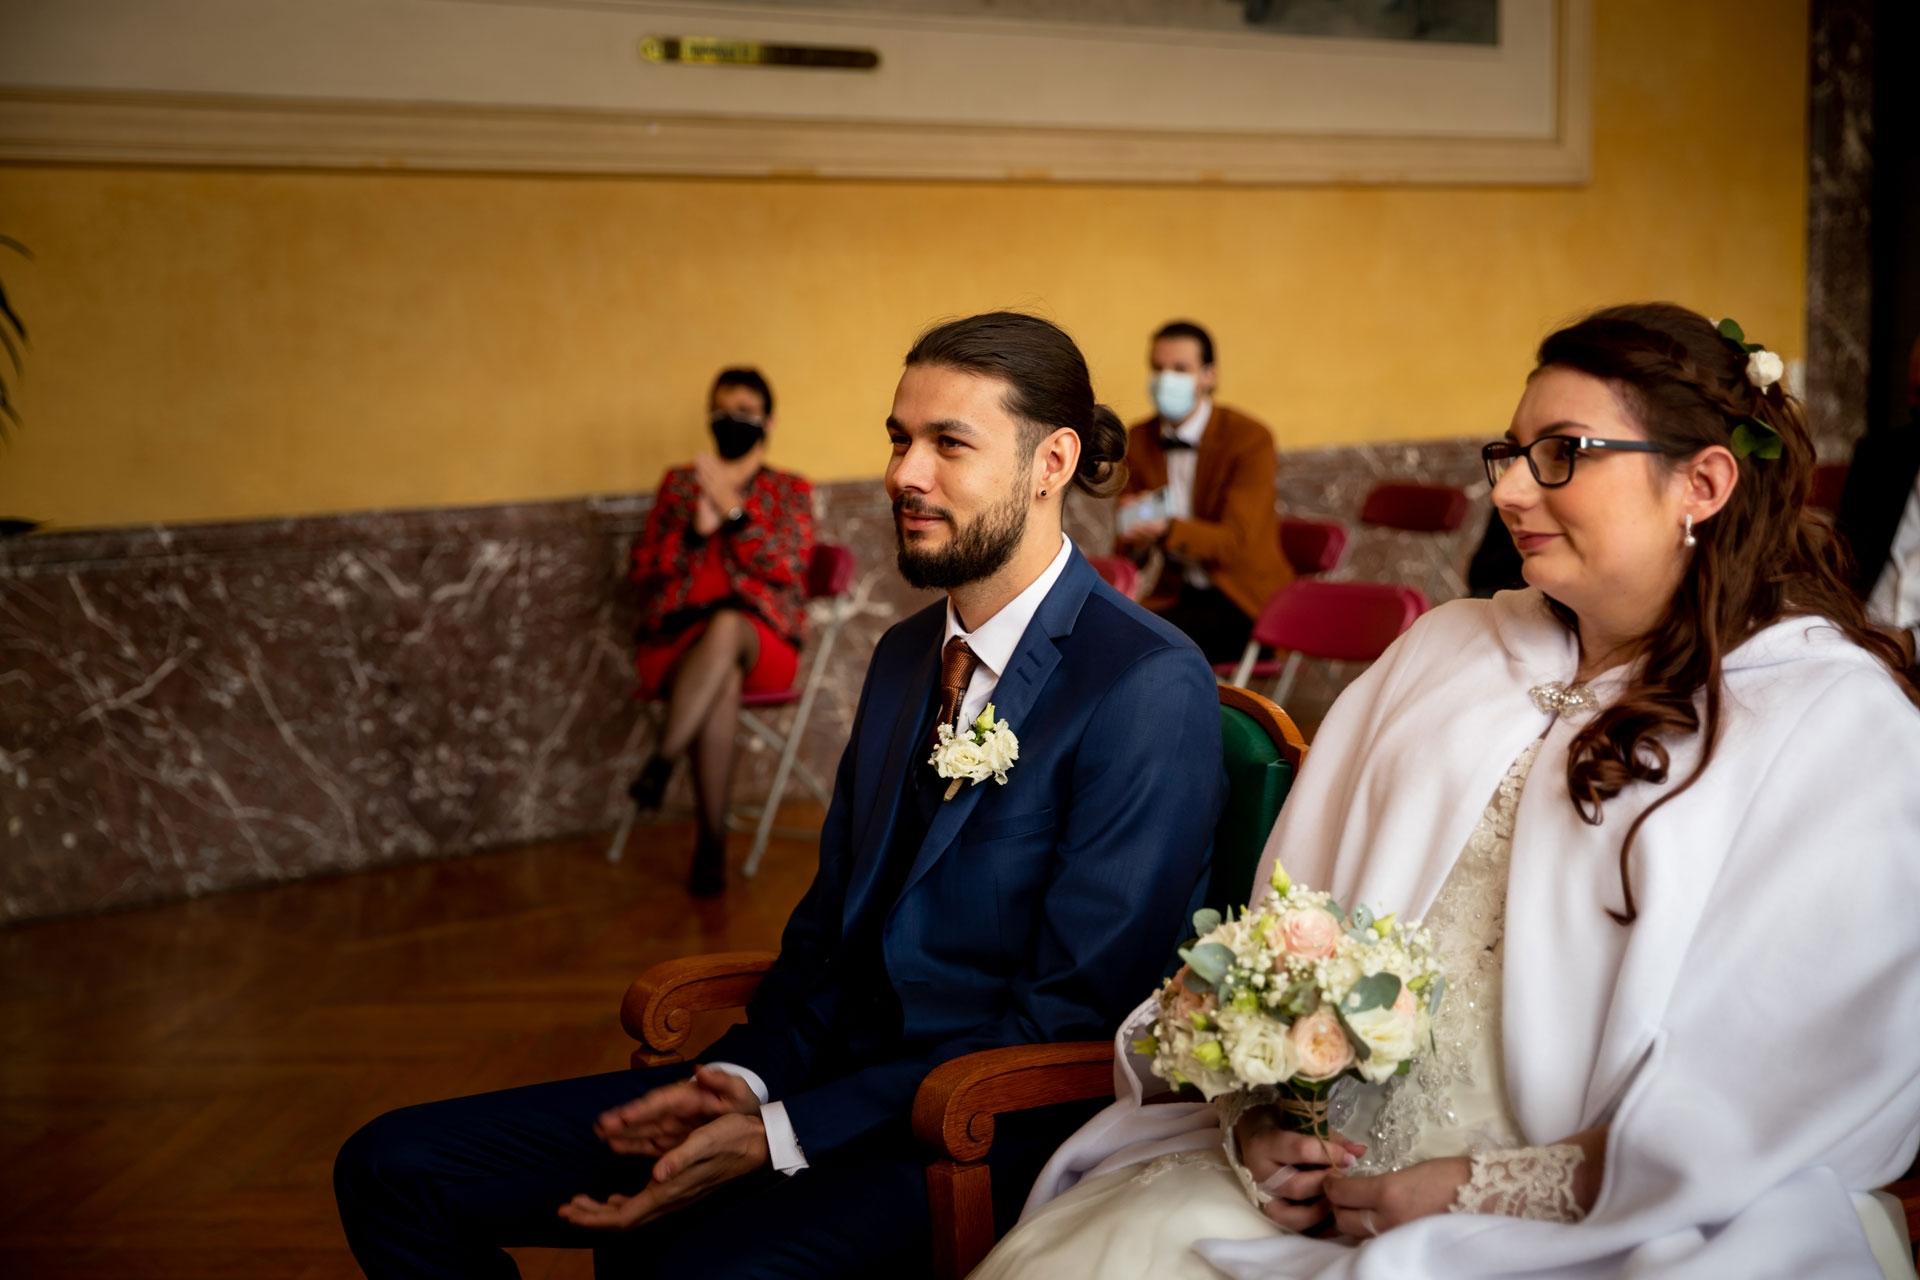 20201017-mariage-justine-alexandre-25